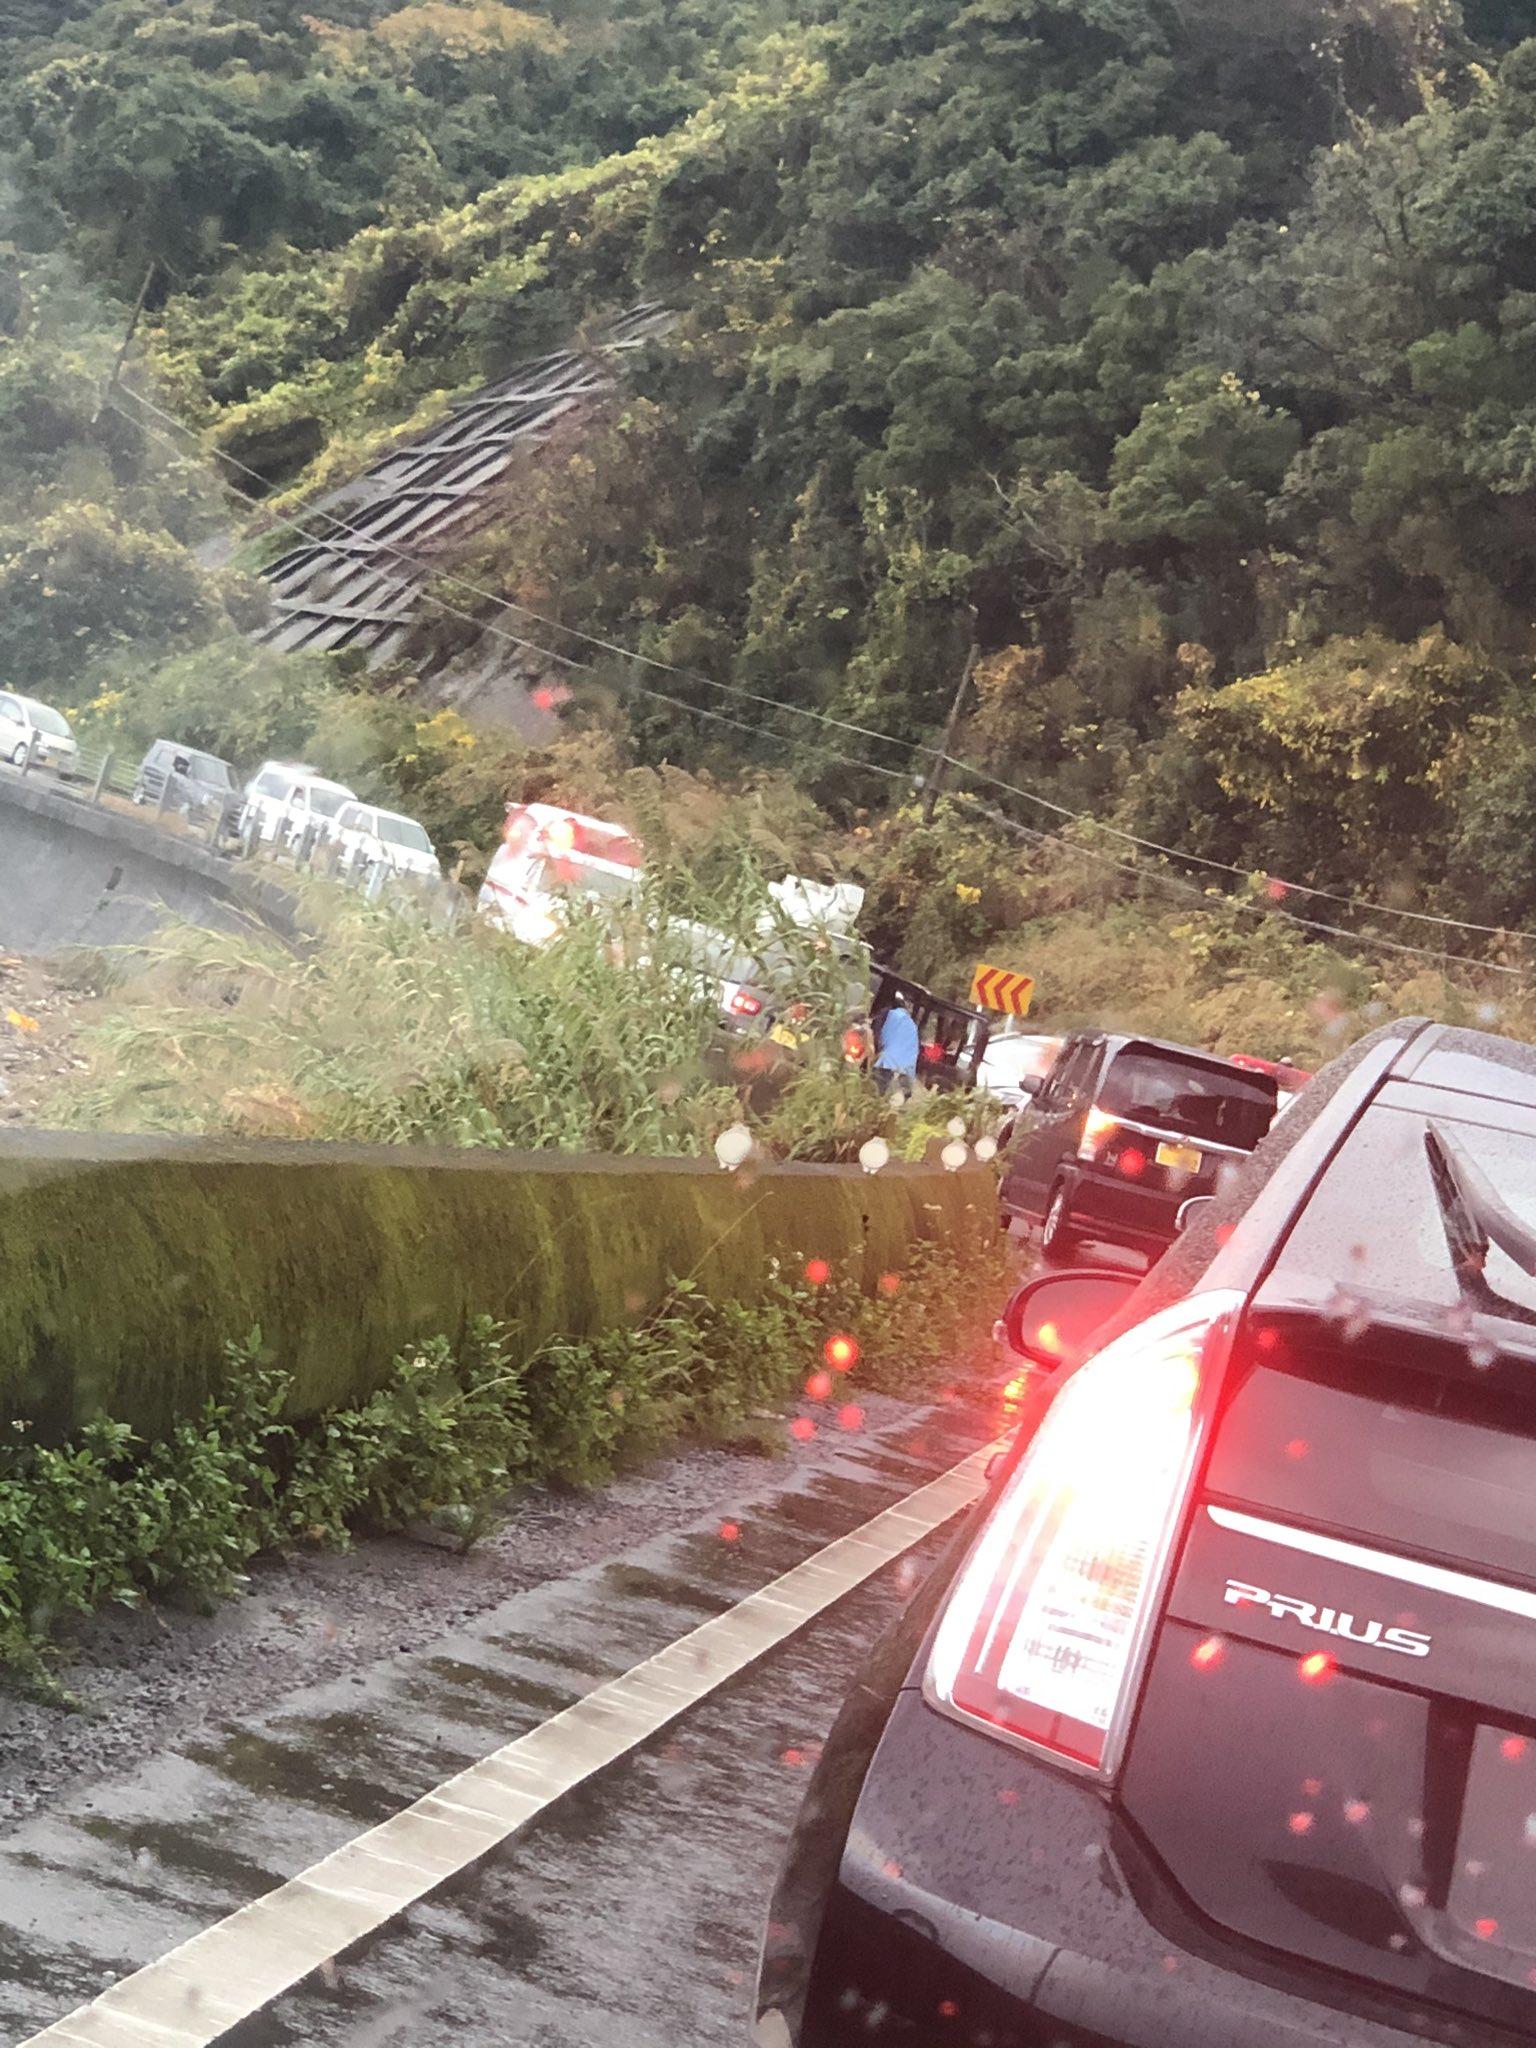 鹿児島市平川町の国道226号線で交通事故の現場画像